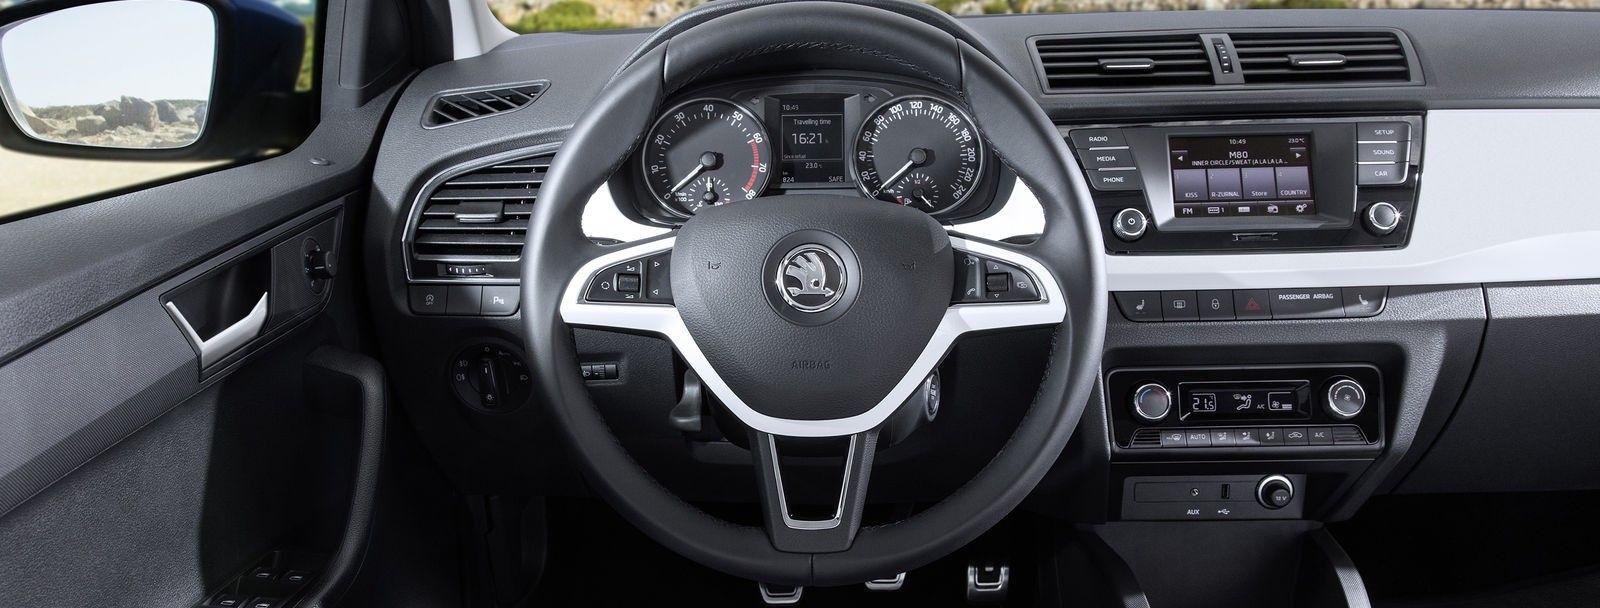 2014 Skoda Fabia Interior Autos Post